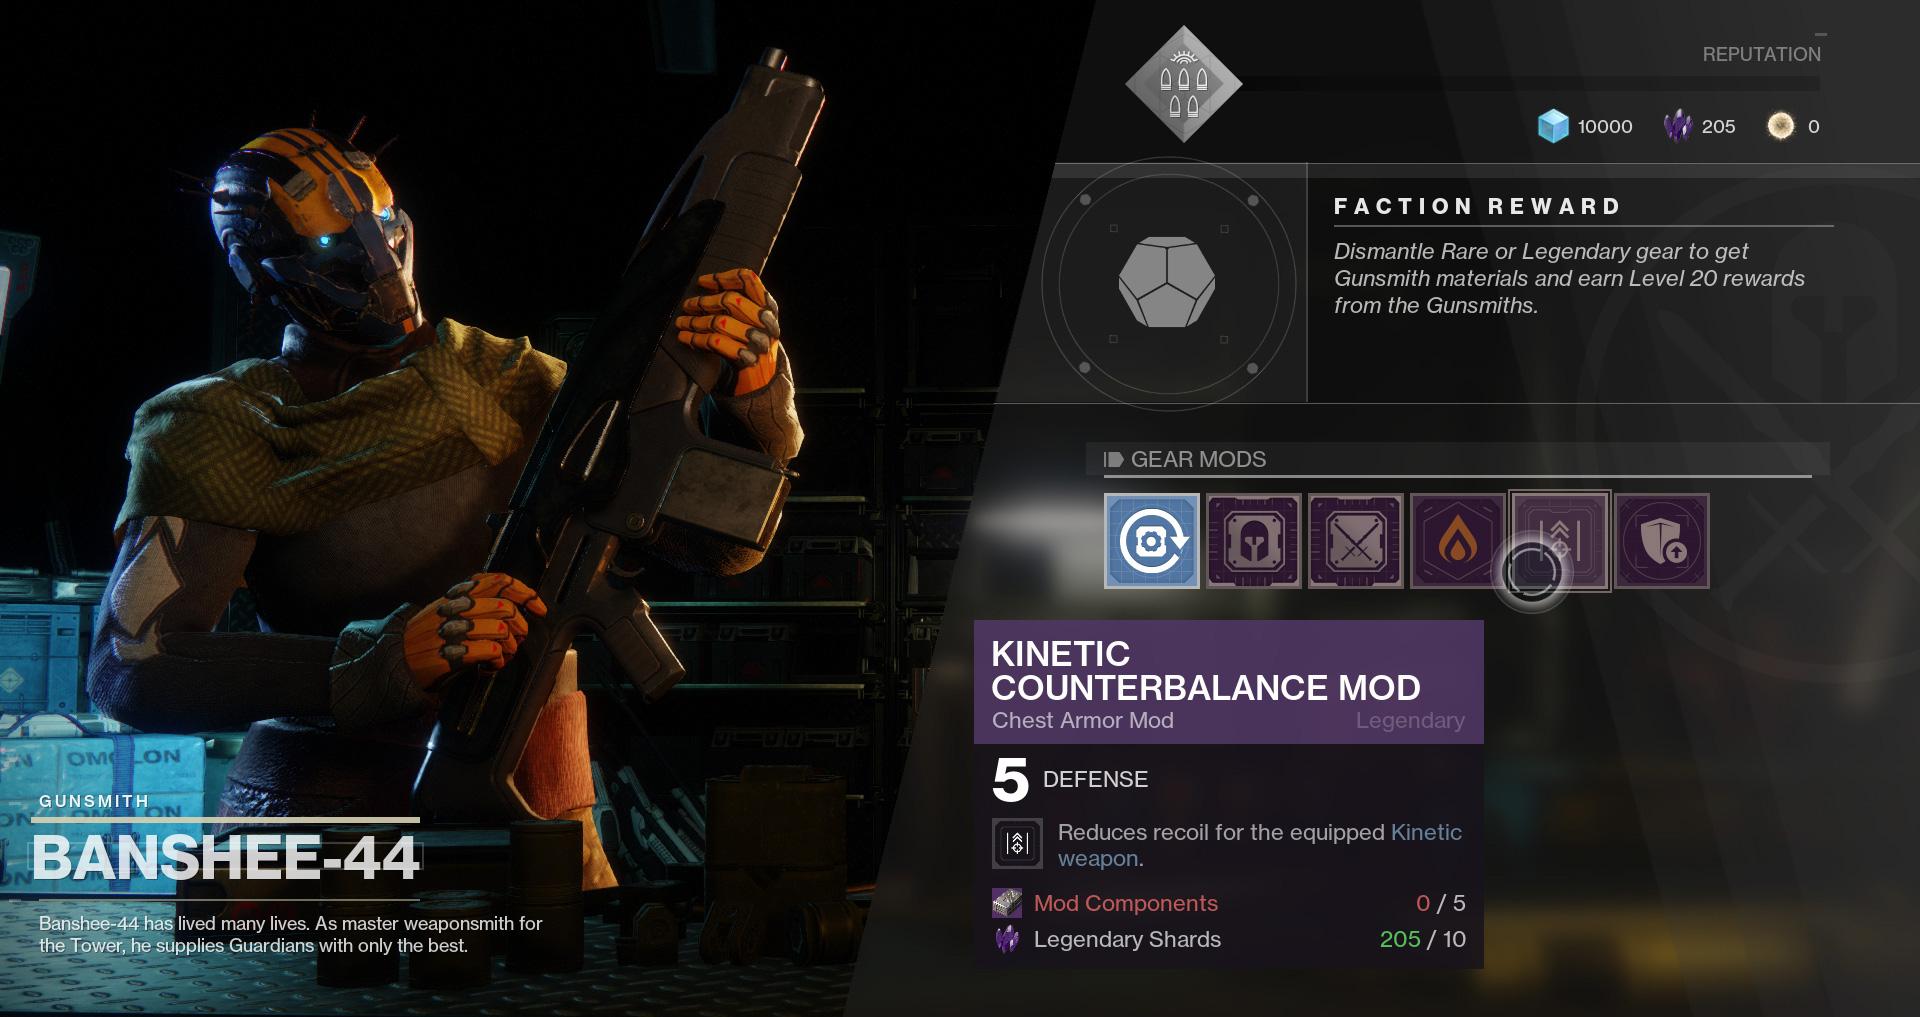 Destiny 2 - Banshee-44 selling kinetic mod